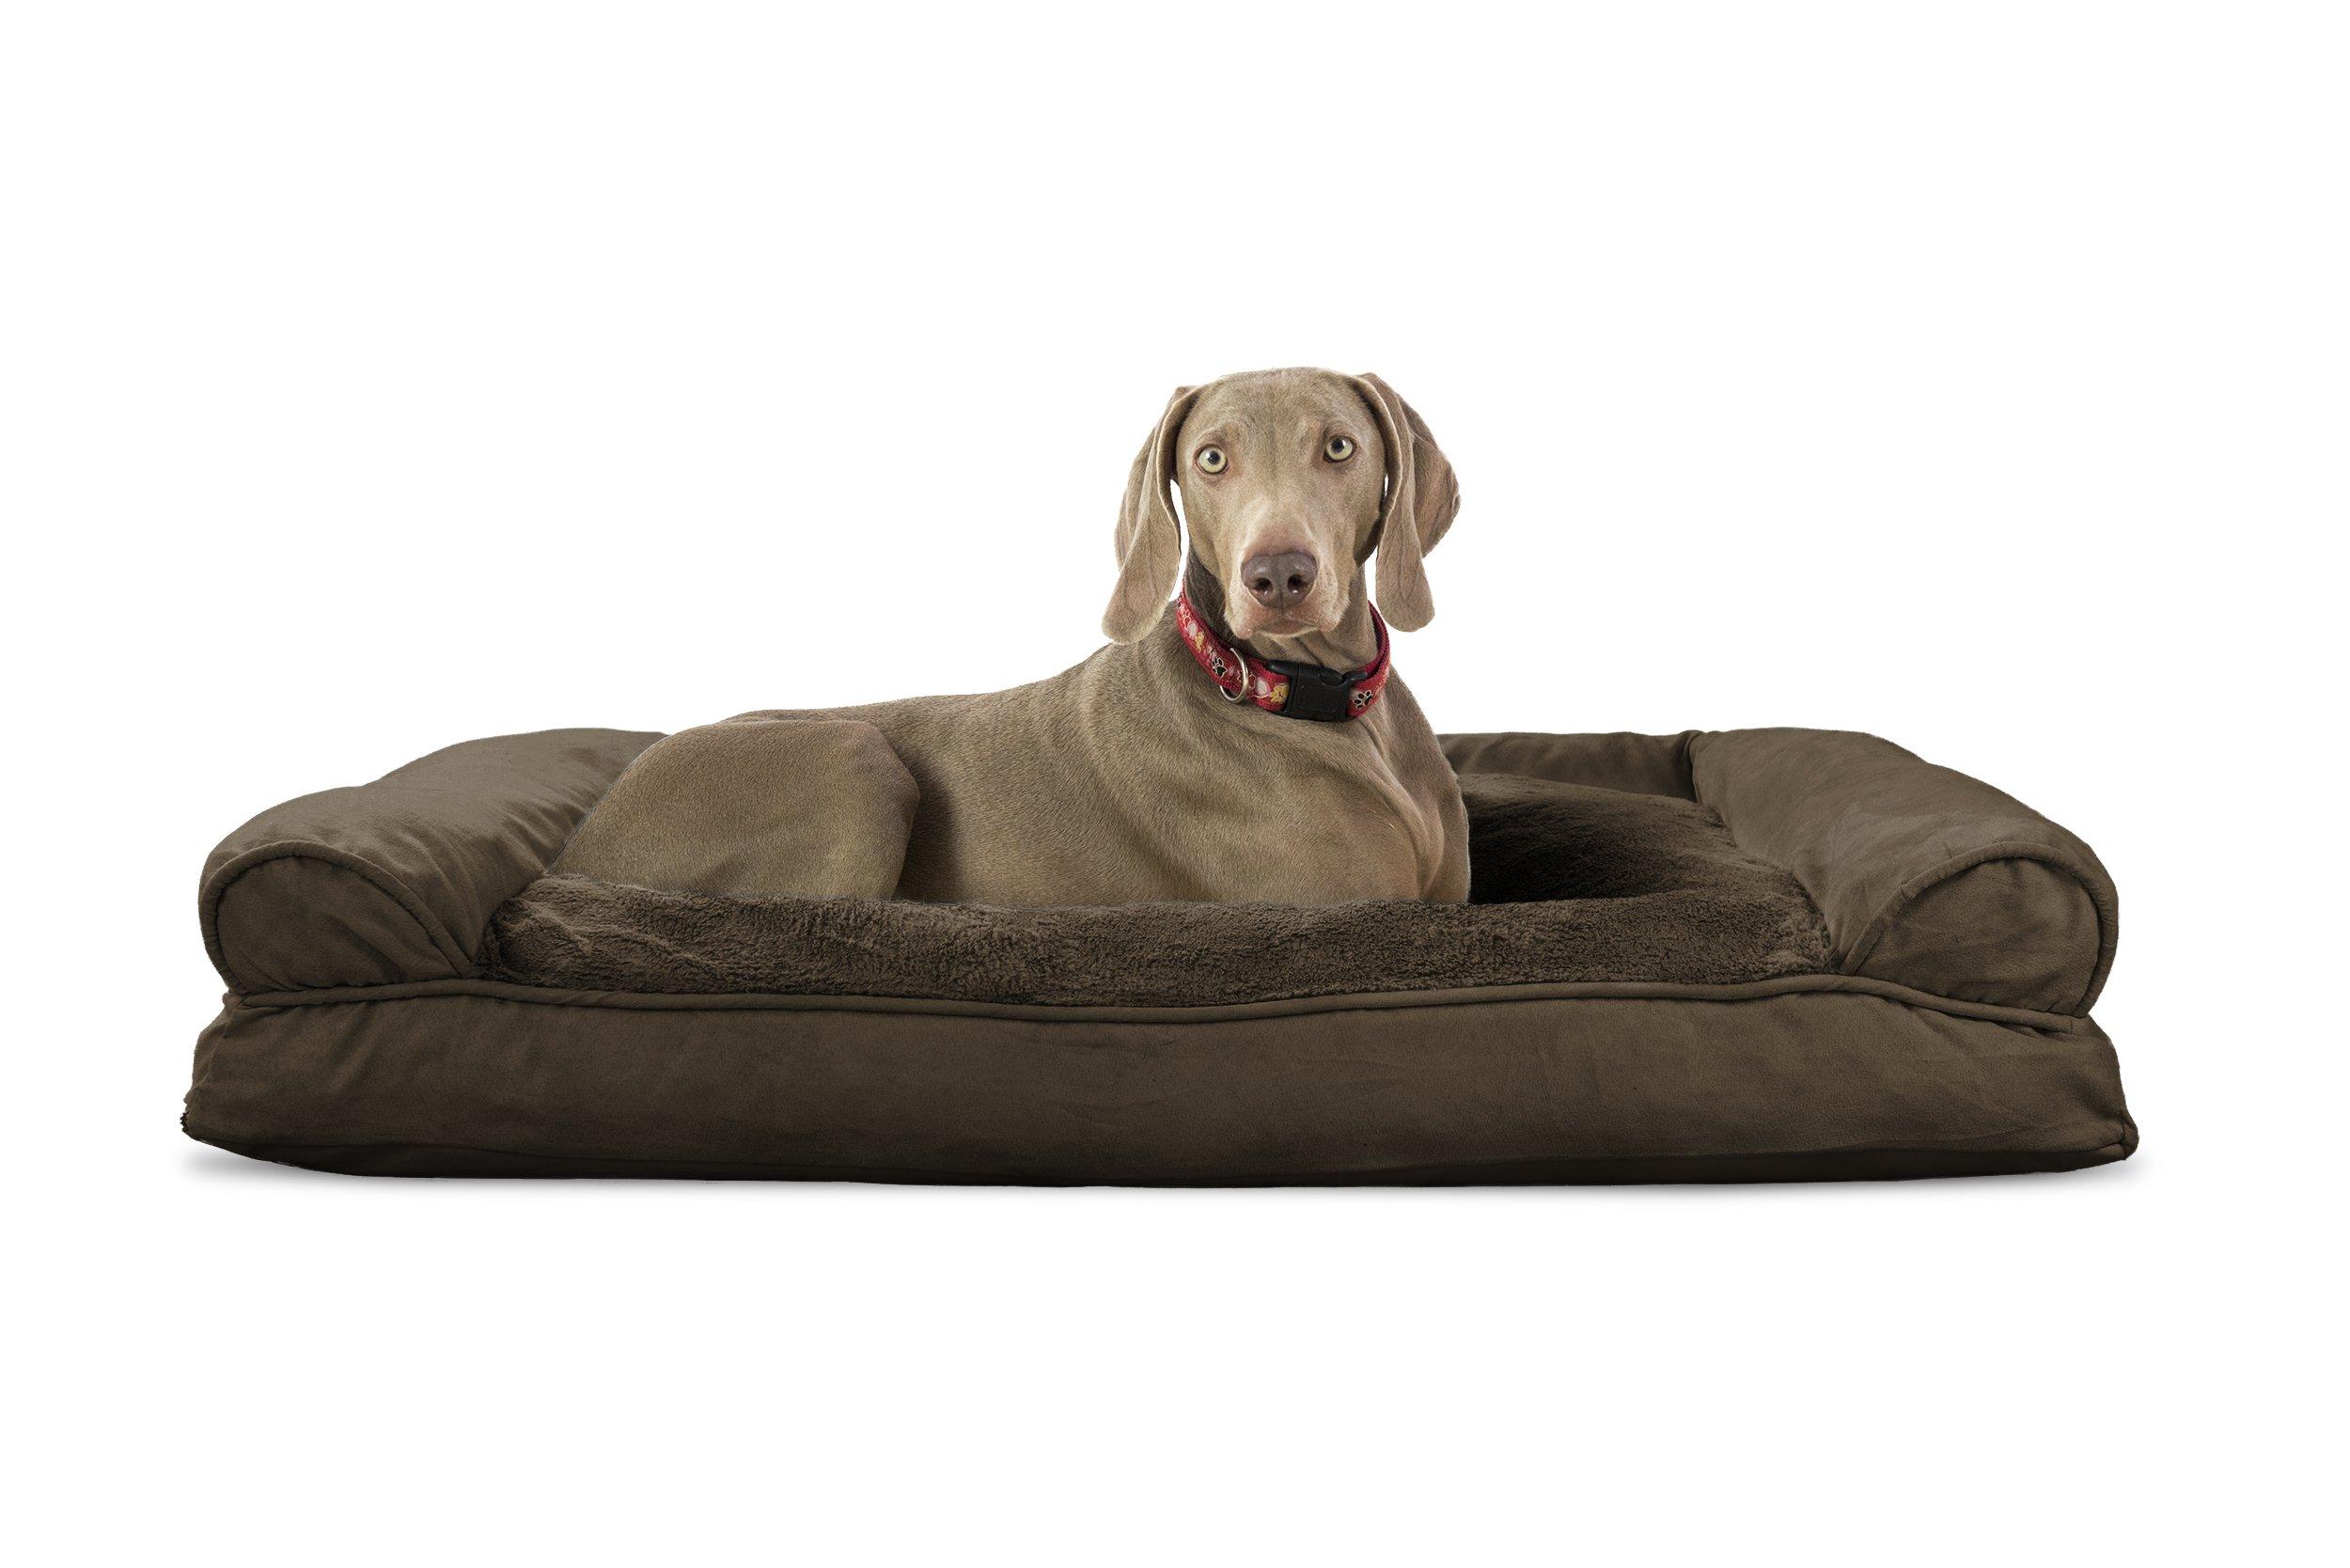 Furhaven Pet Plush & Suede Pillow Sofa Pet Bed, Espresso, Jumbo